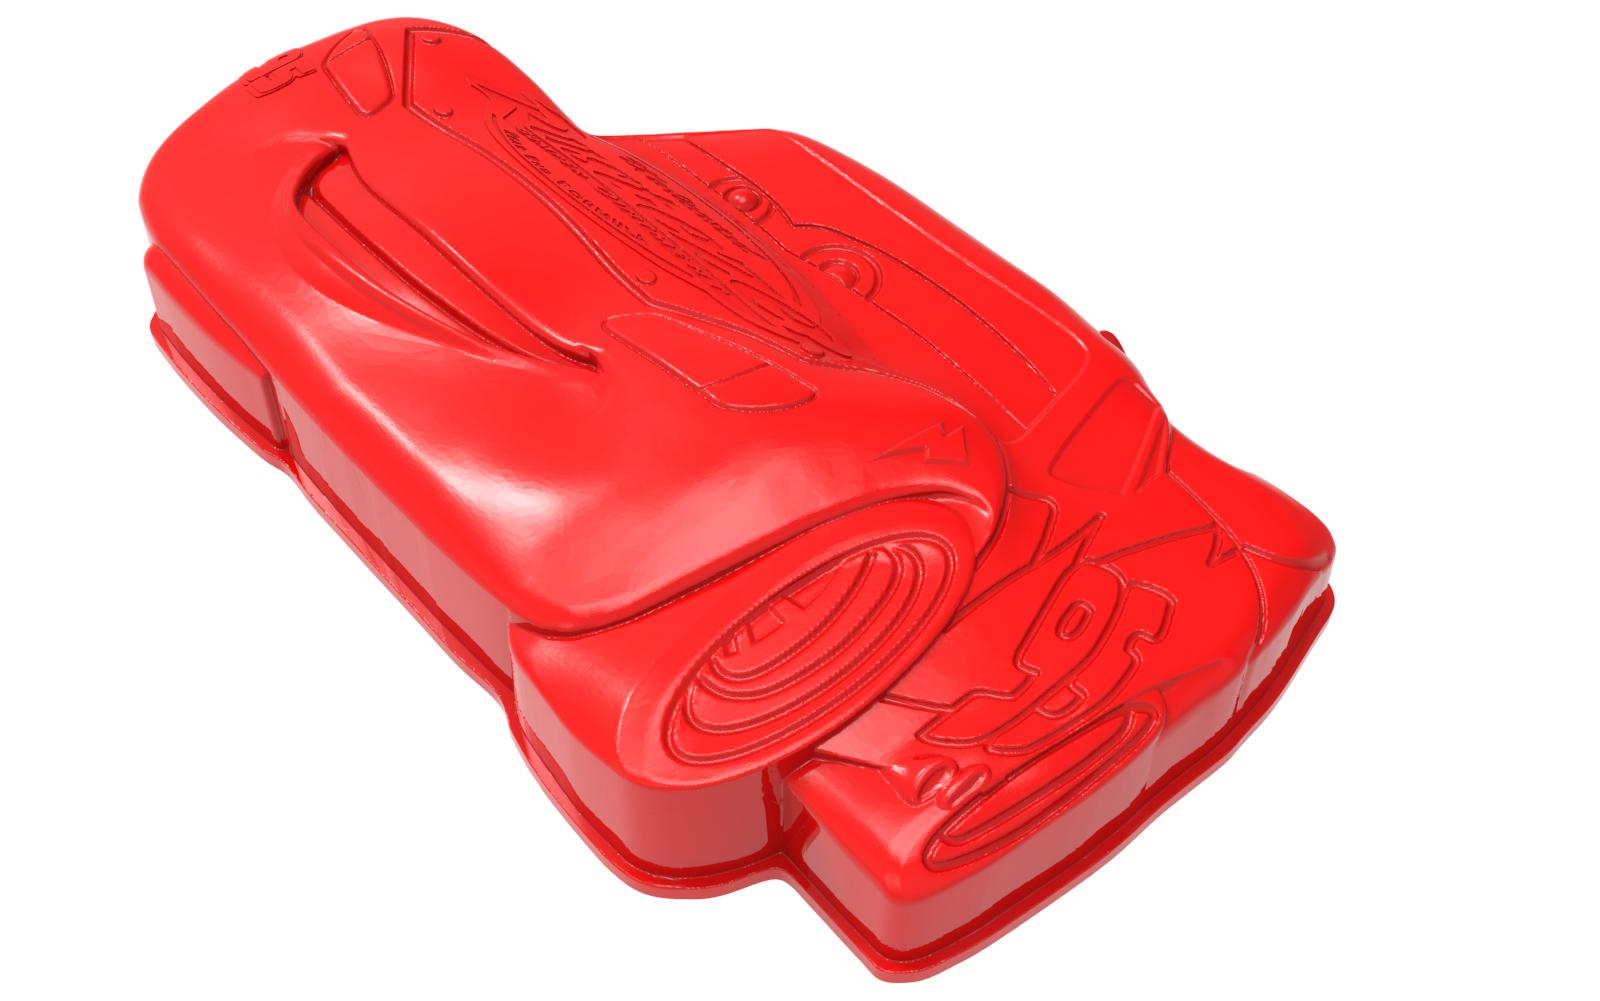 untitled.1663.png Download free STL file Pixar Cars - Mcqueen • 3D printable design, hcchong